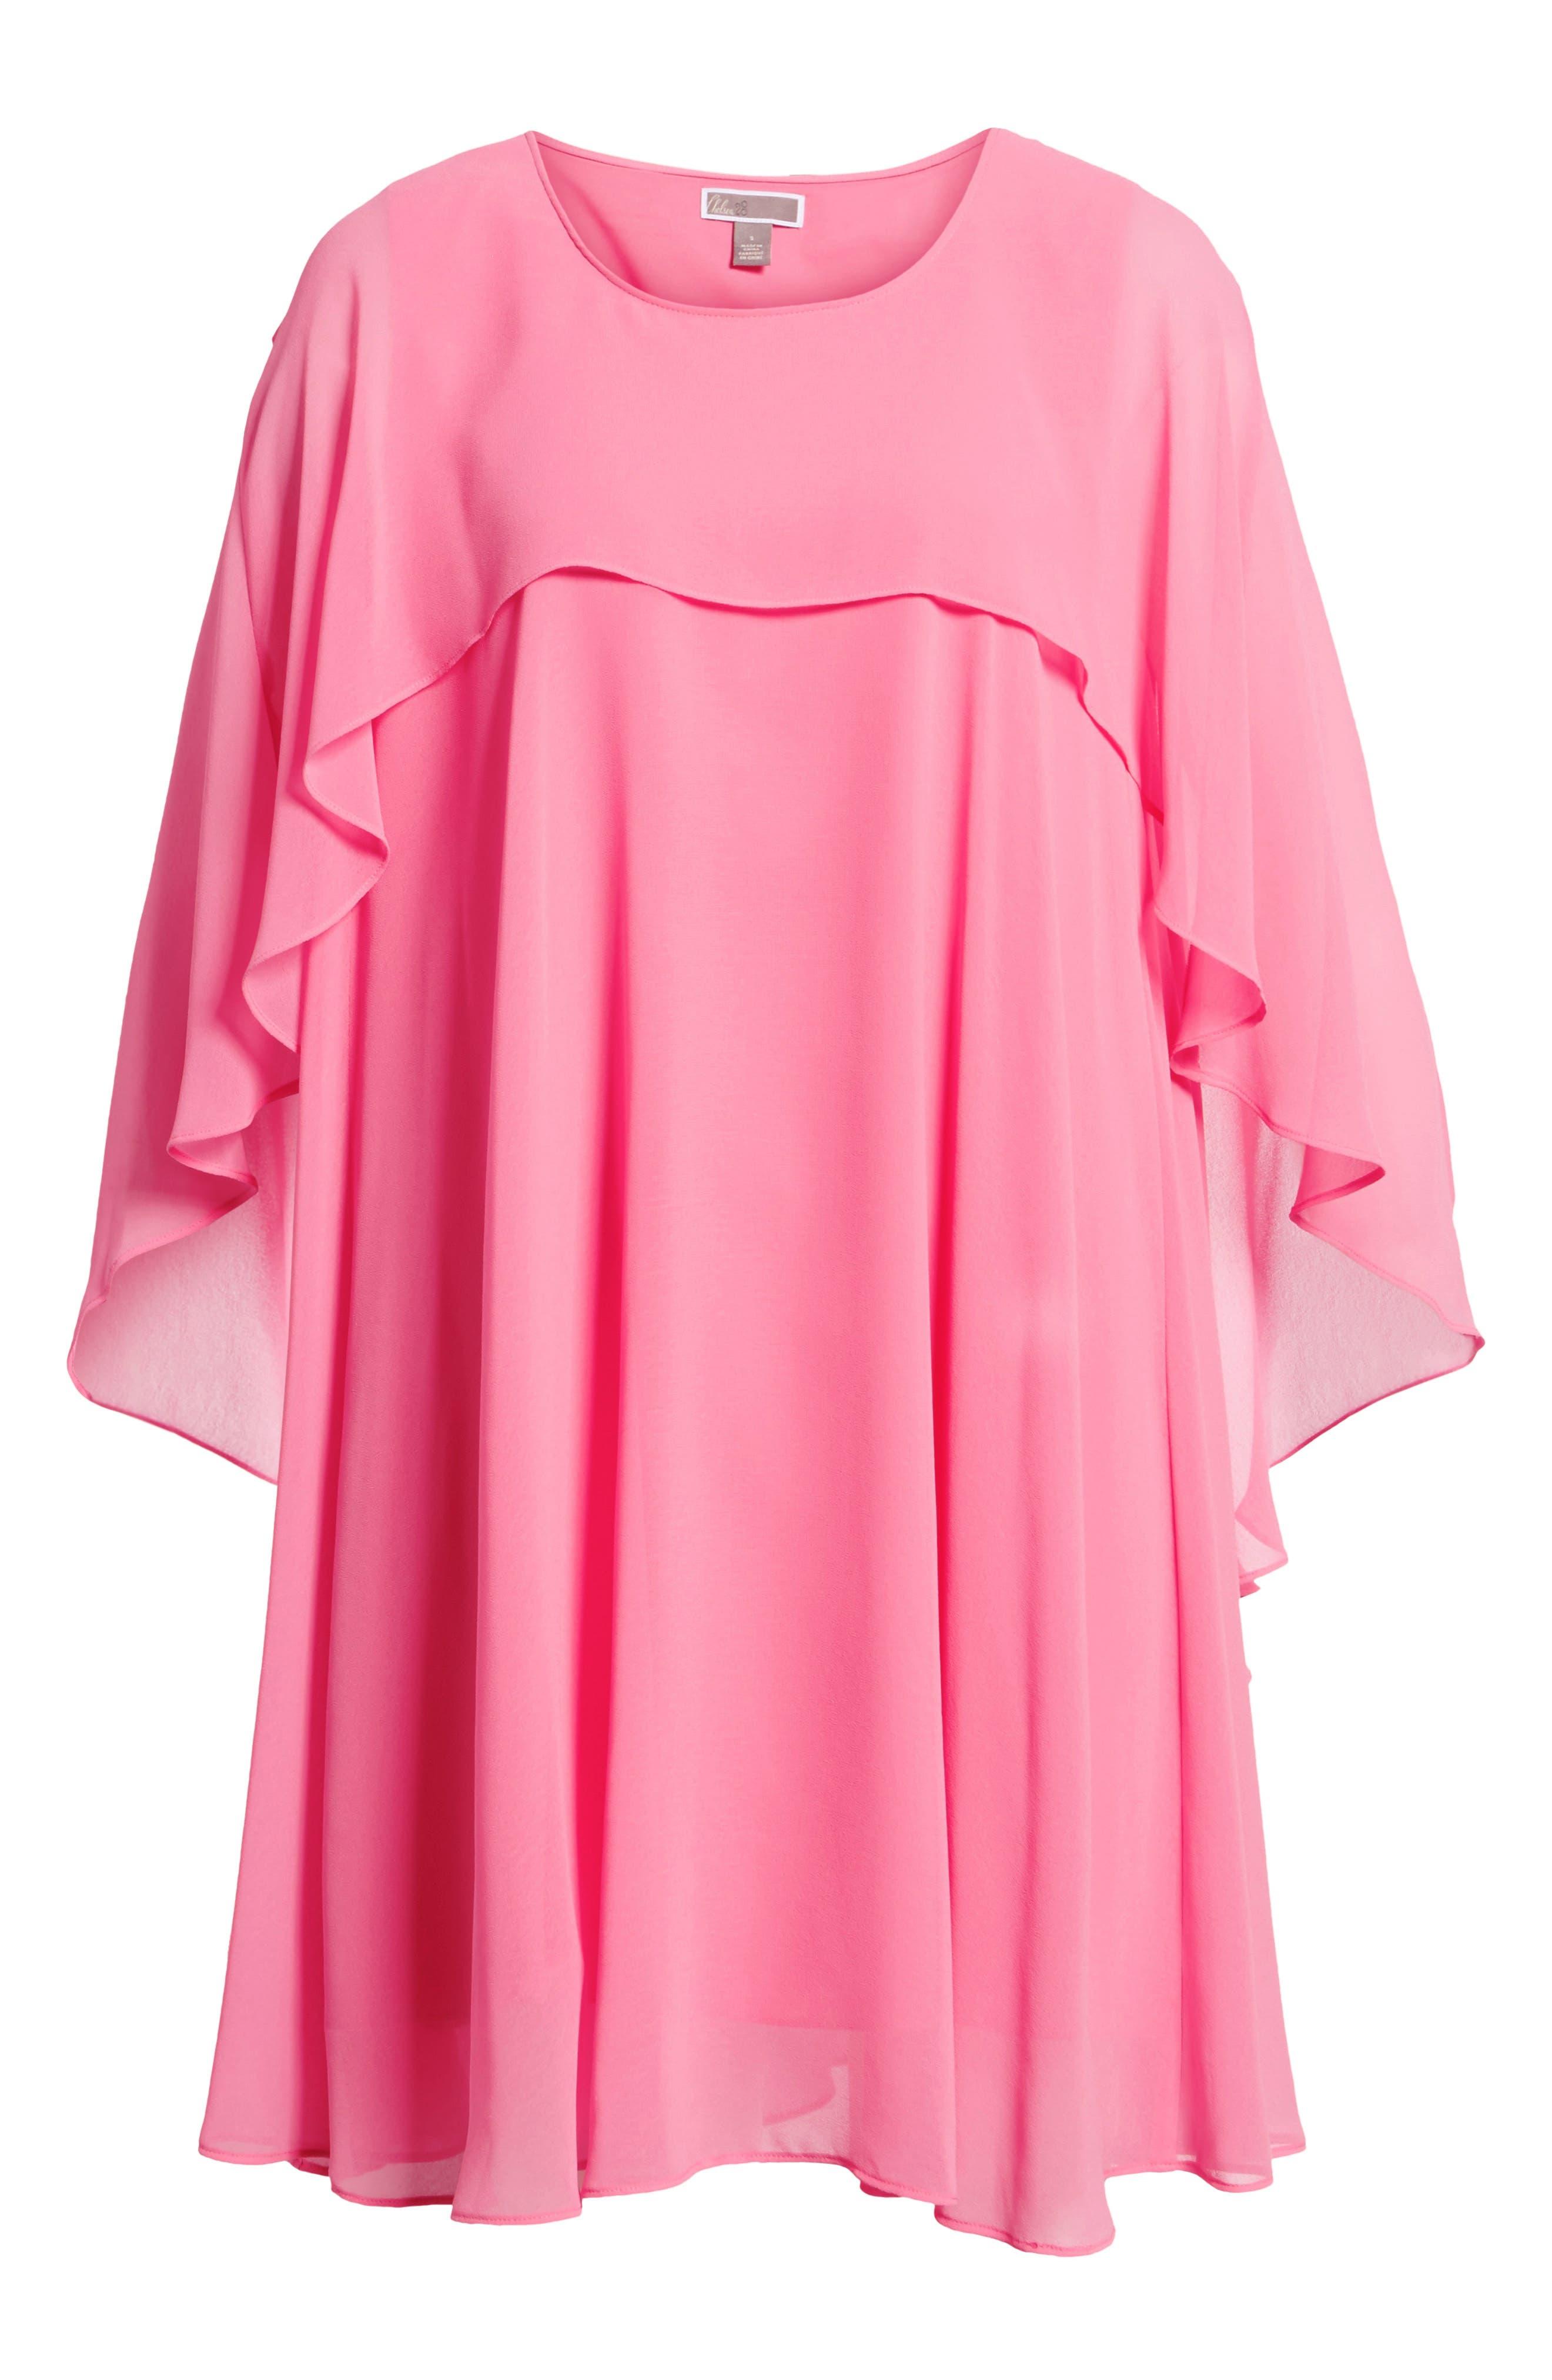 A-Line Chiffon Dress,                             Alternate thumbnail 6, color,                             Pink Zenna